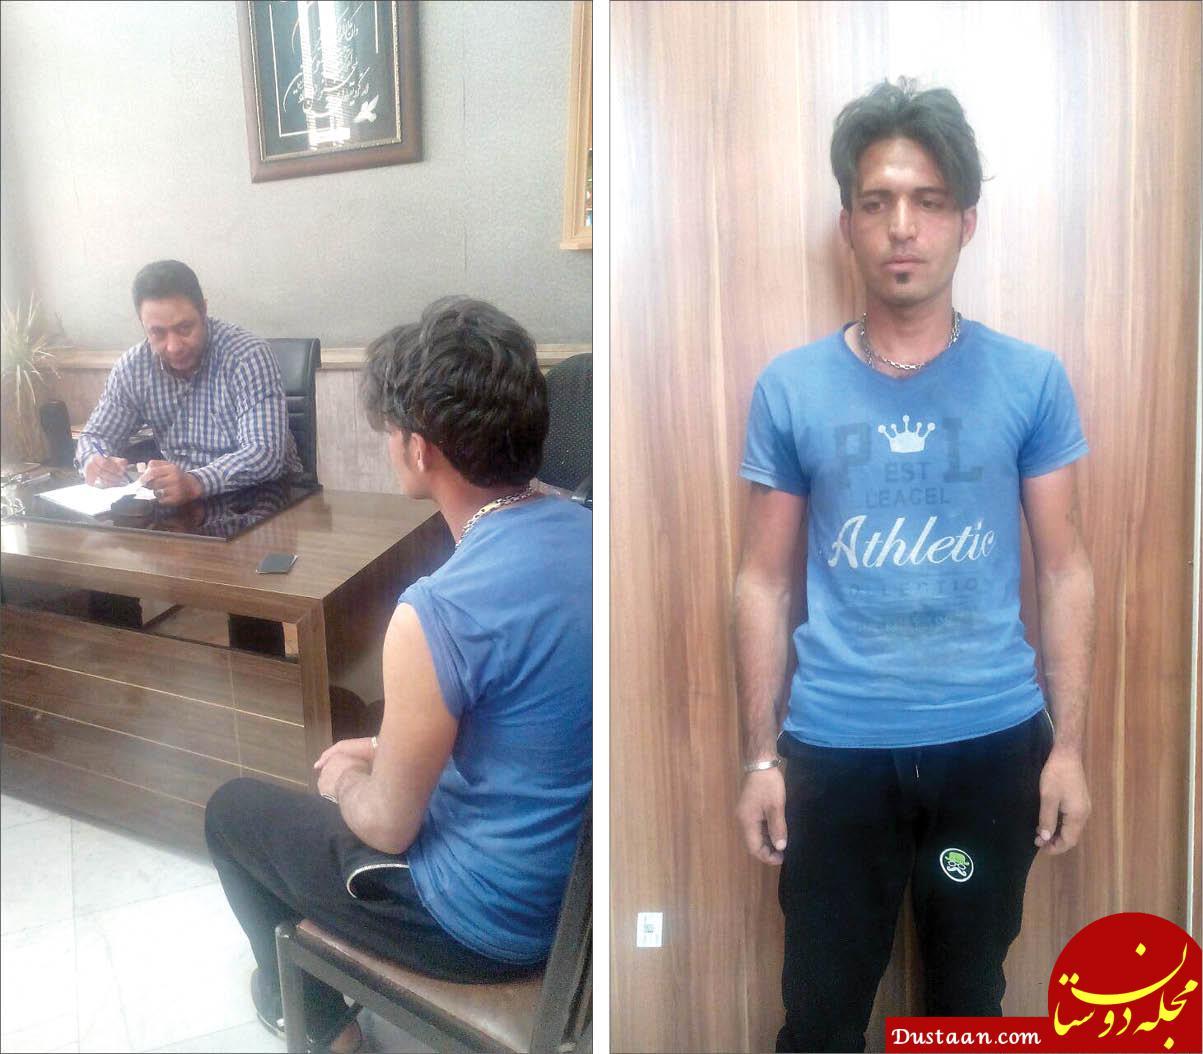 www.dustaan.com متهم: رگ گردن مرد قصاب را با تیغ موکت بری زدم! +عکس